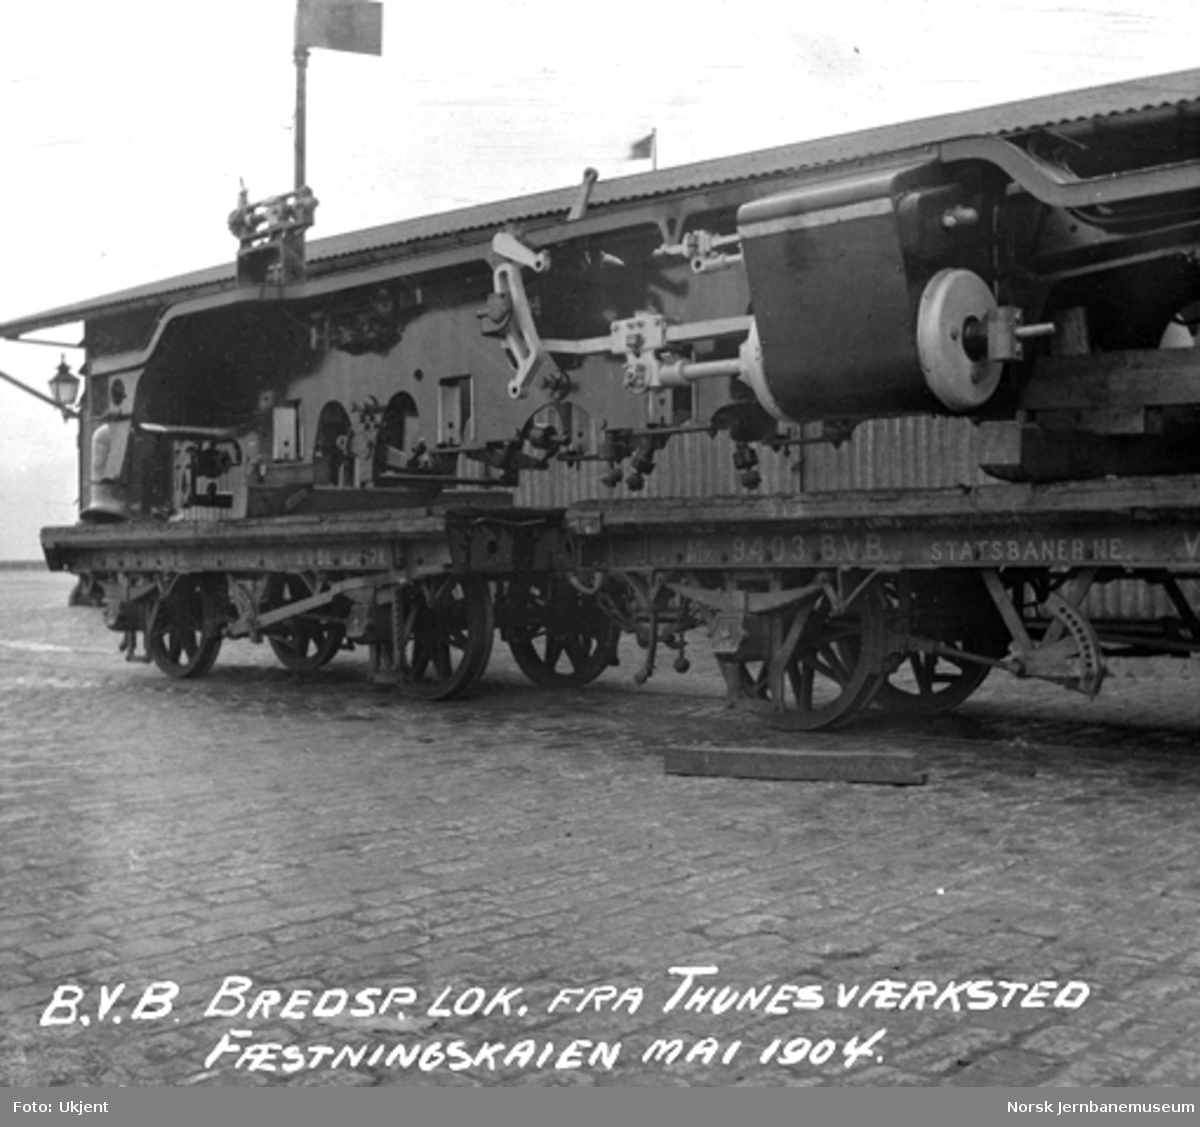 Normalspormateriell til Bergensbanen : ramme til damplokomotiv type 21a opplastet på godsvogner på Festningskaien i Oslo